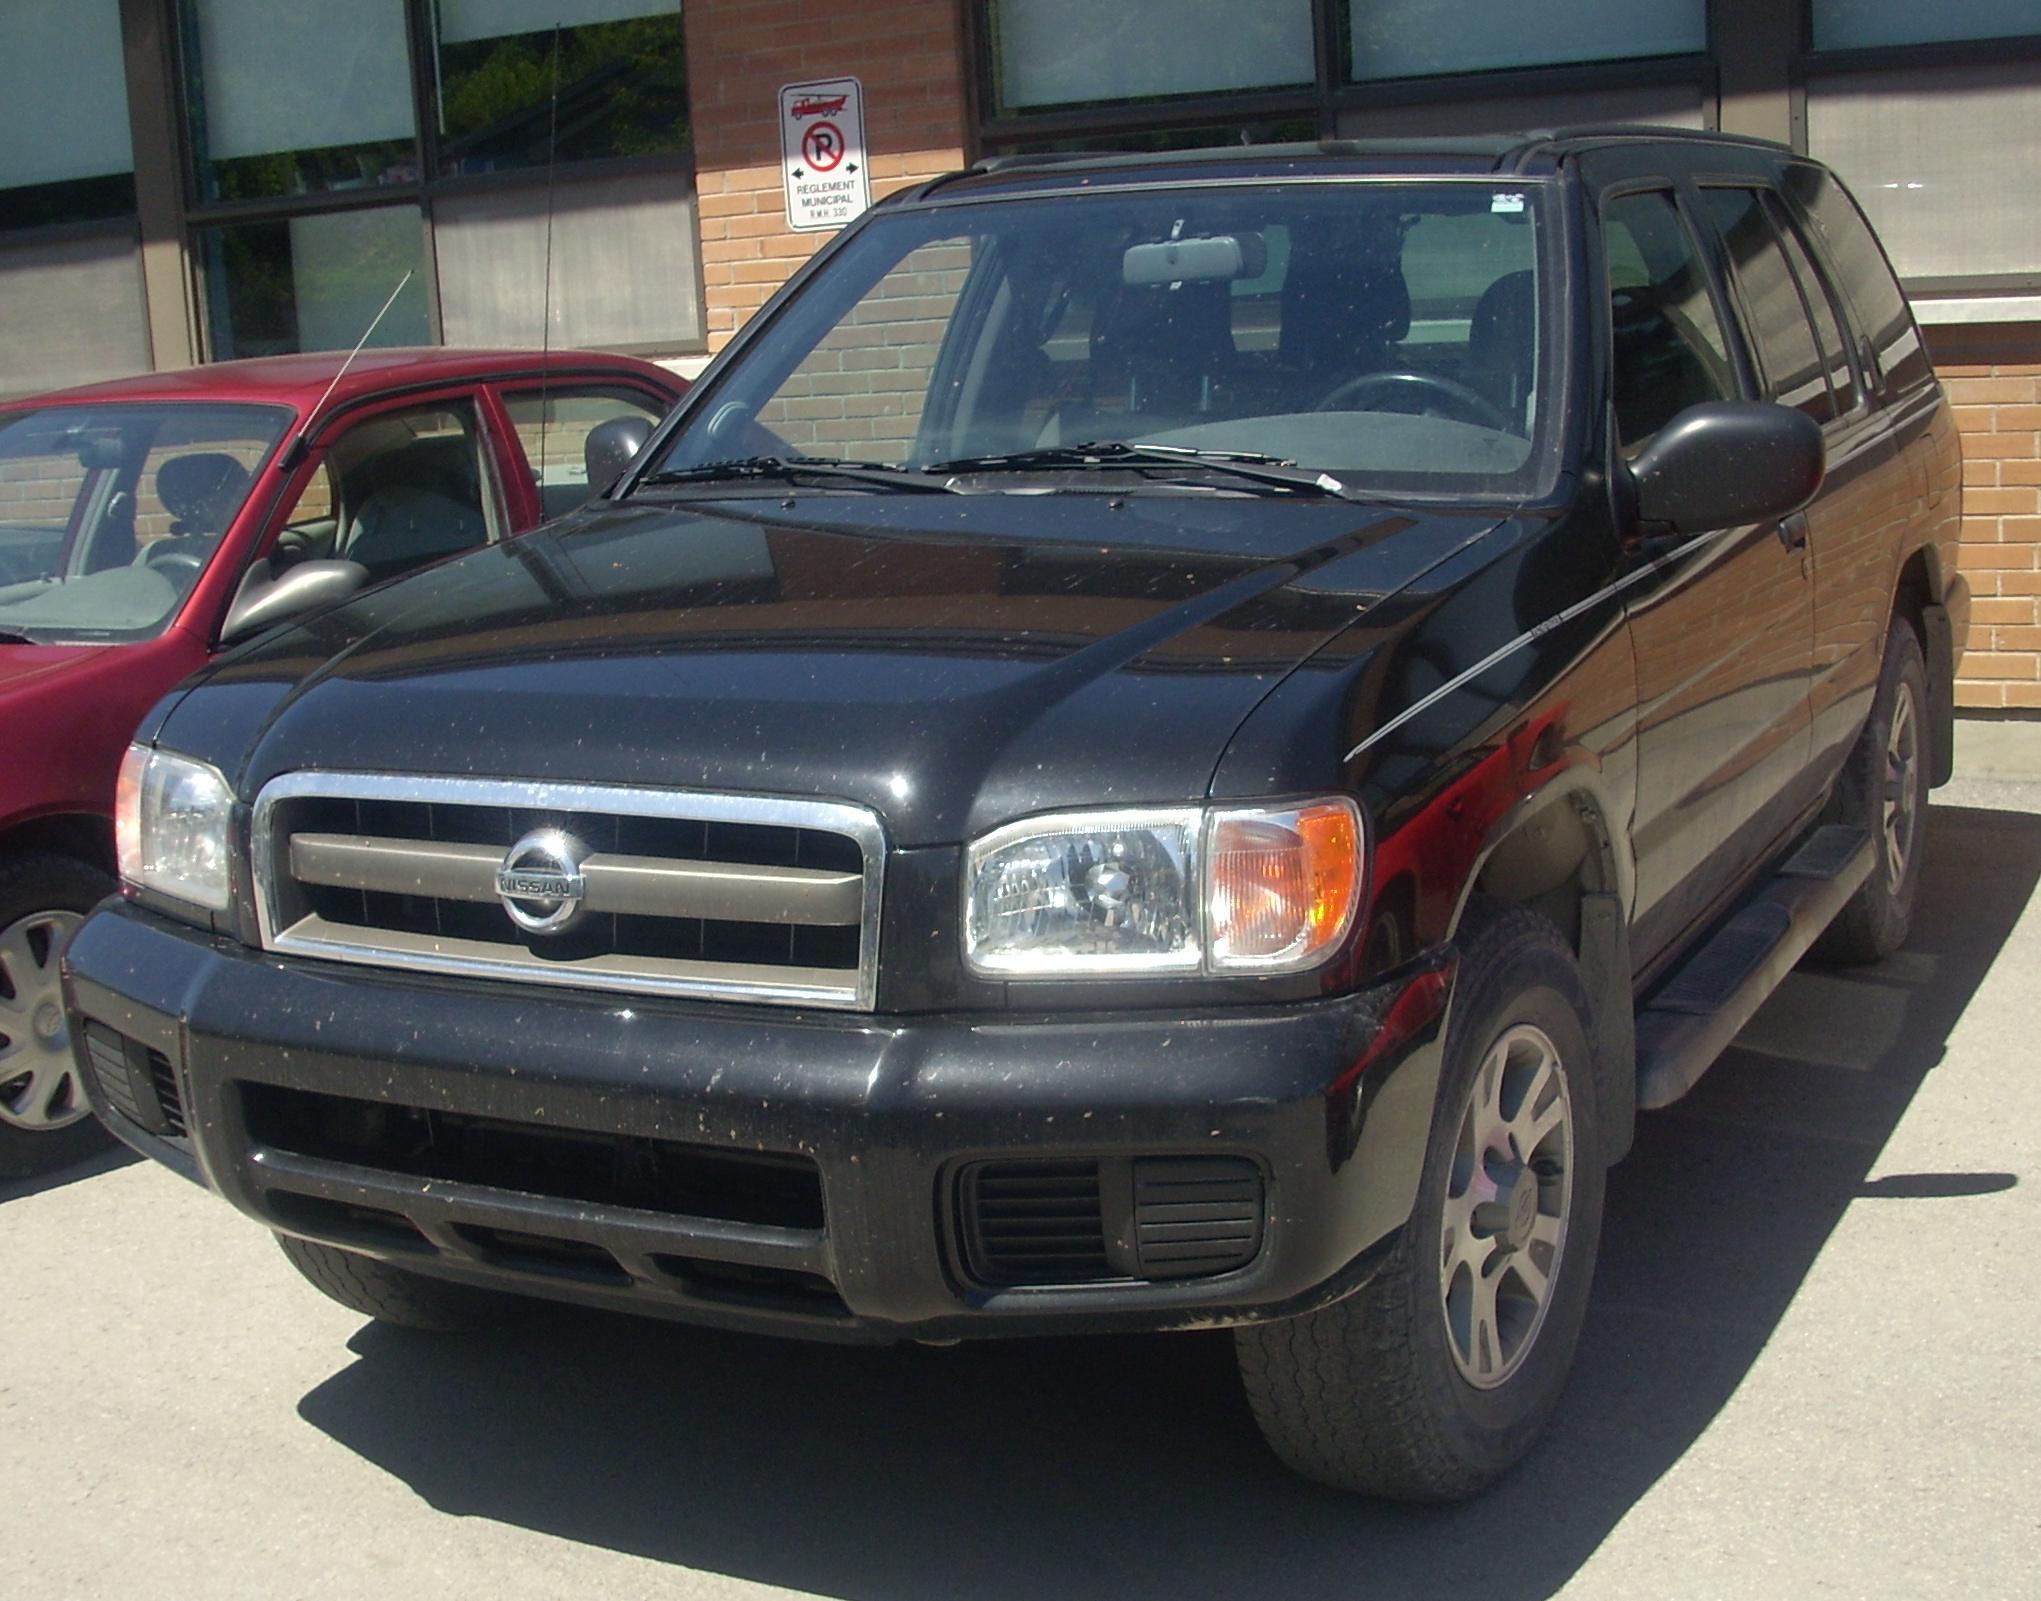 File:'02-'04 Nissan Pathfinder (Hudson).JPG - Wikimedia Commons